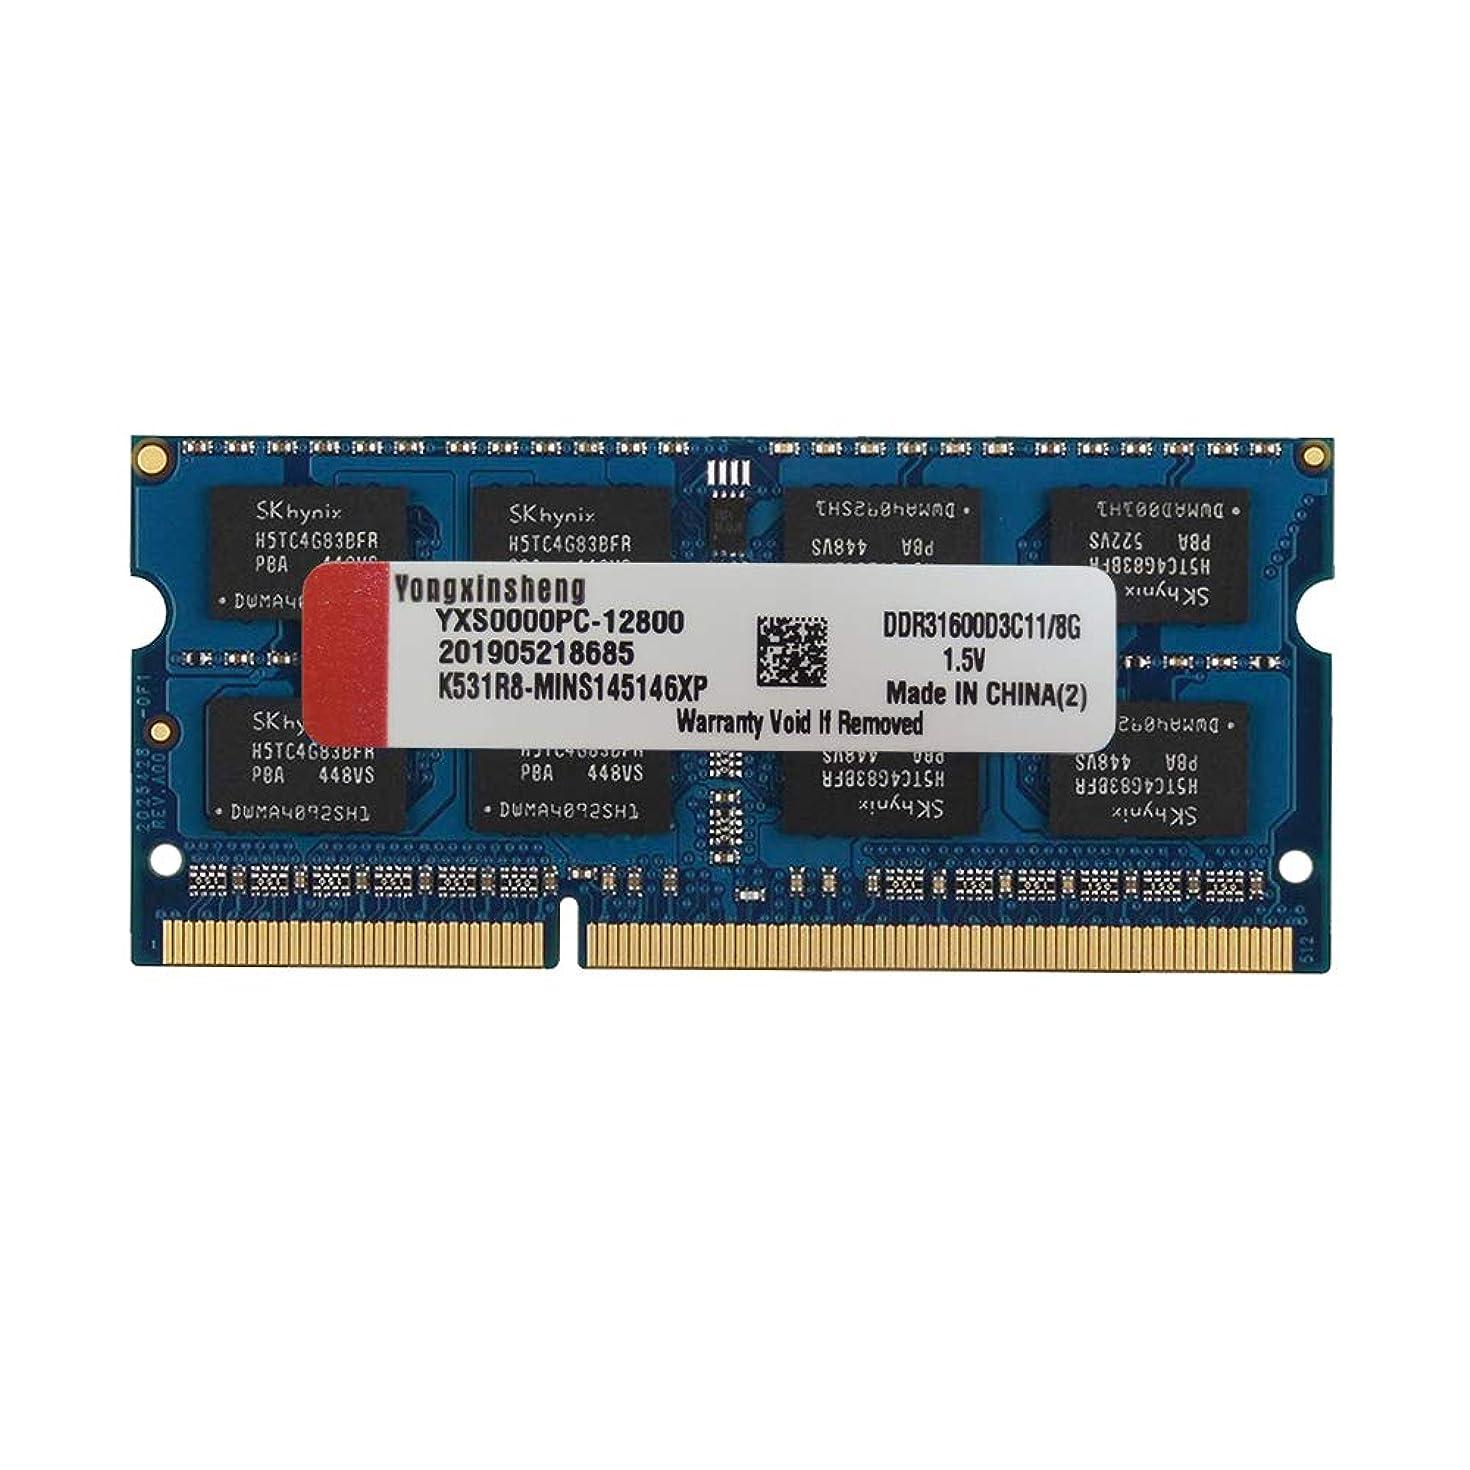 Yongxinsheng DDR3 8GB 1600Mhz SODIMM PC3 Laptop General Memory Ram Blue Board